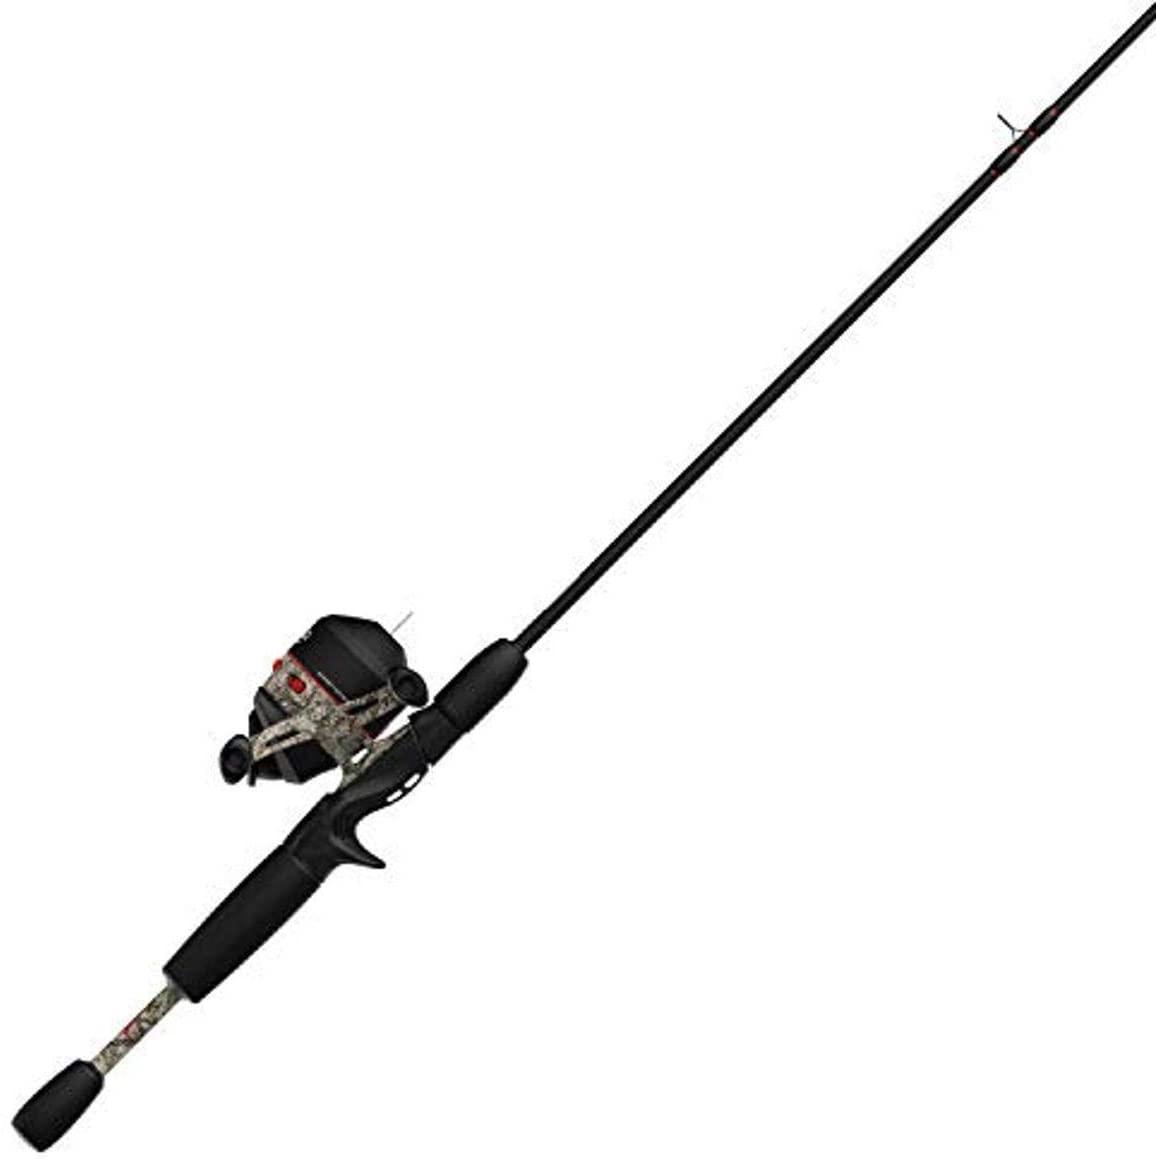 Zebco 33 Approach Spincast Reel and 2-Piece Fishing Rod Combo, 6-Foot Fiberglass Rod with Comfortable Split-Grip EVA Handle, Quickset Anti-Reverse Fishing Reel with Bite Alert, Camo/Pink